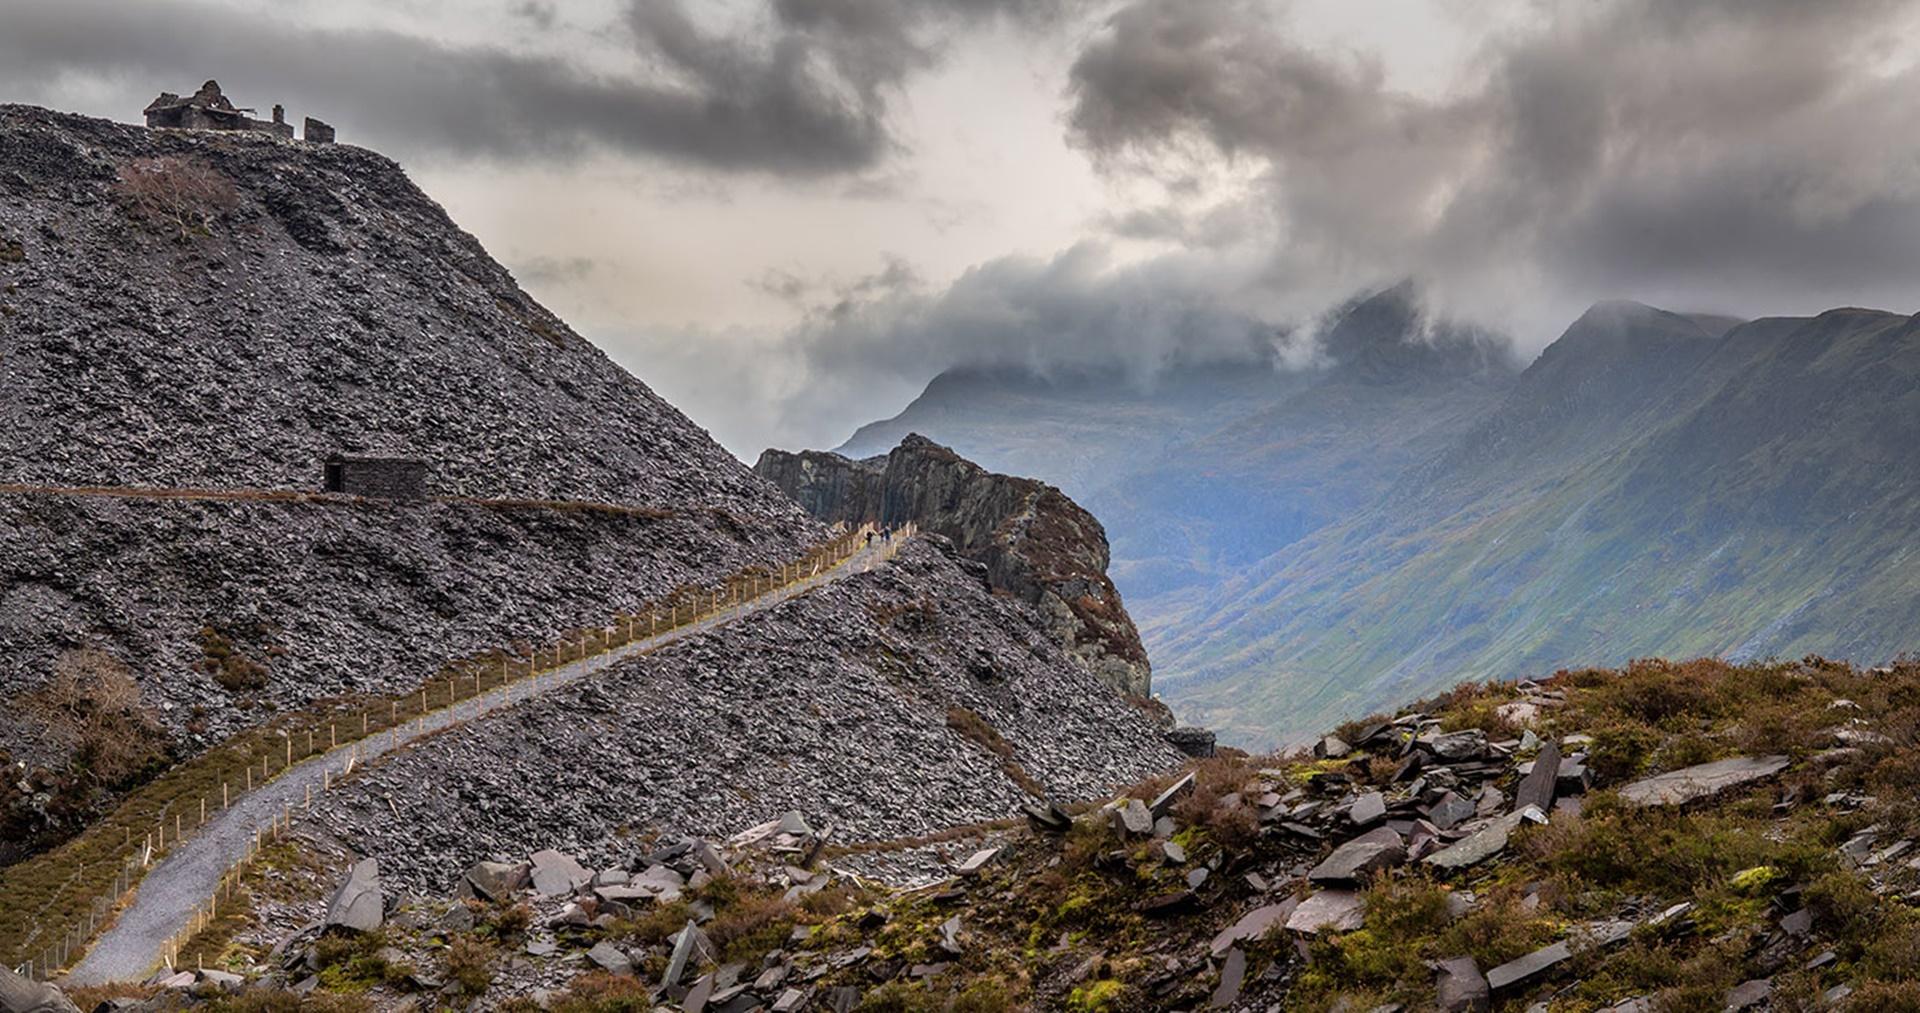 Slate Quarry Path by Terry Jamieson – winner